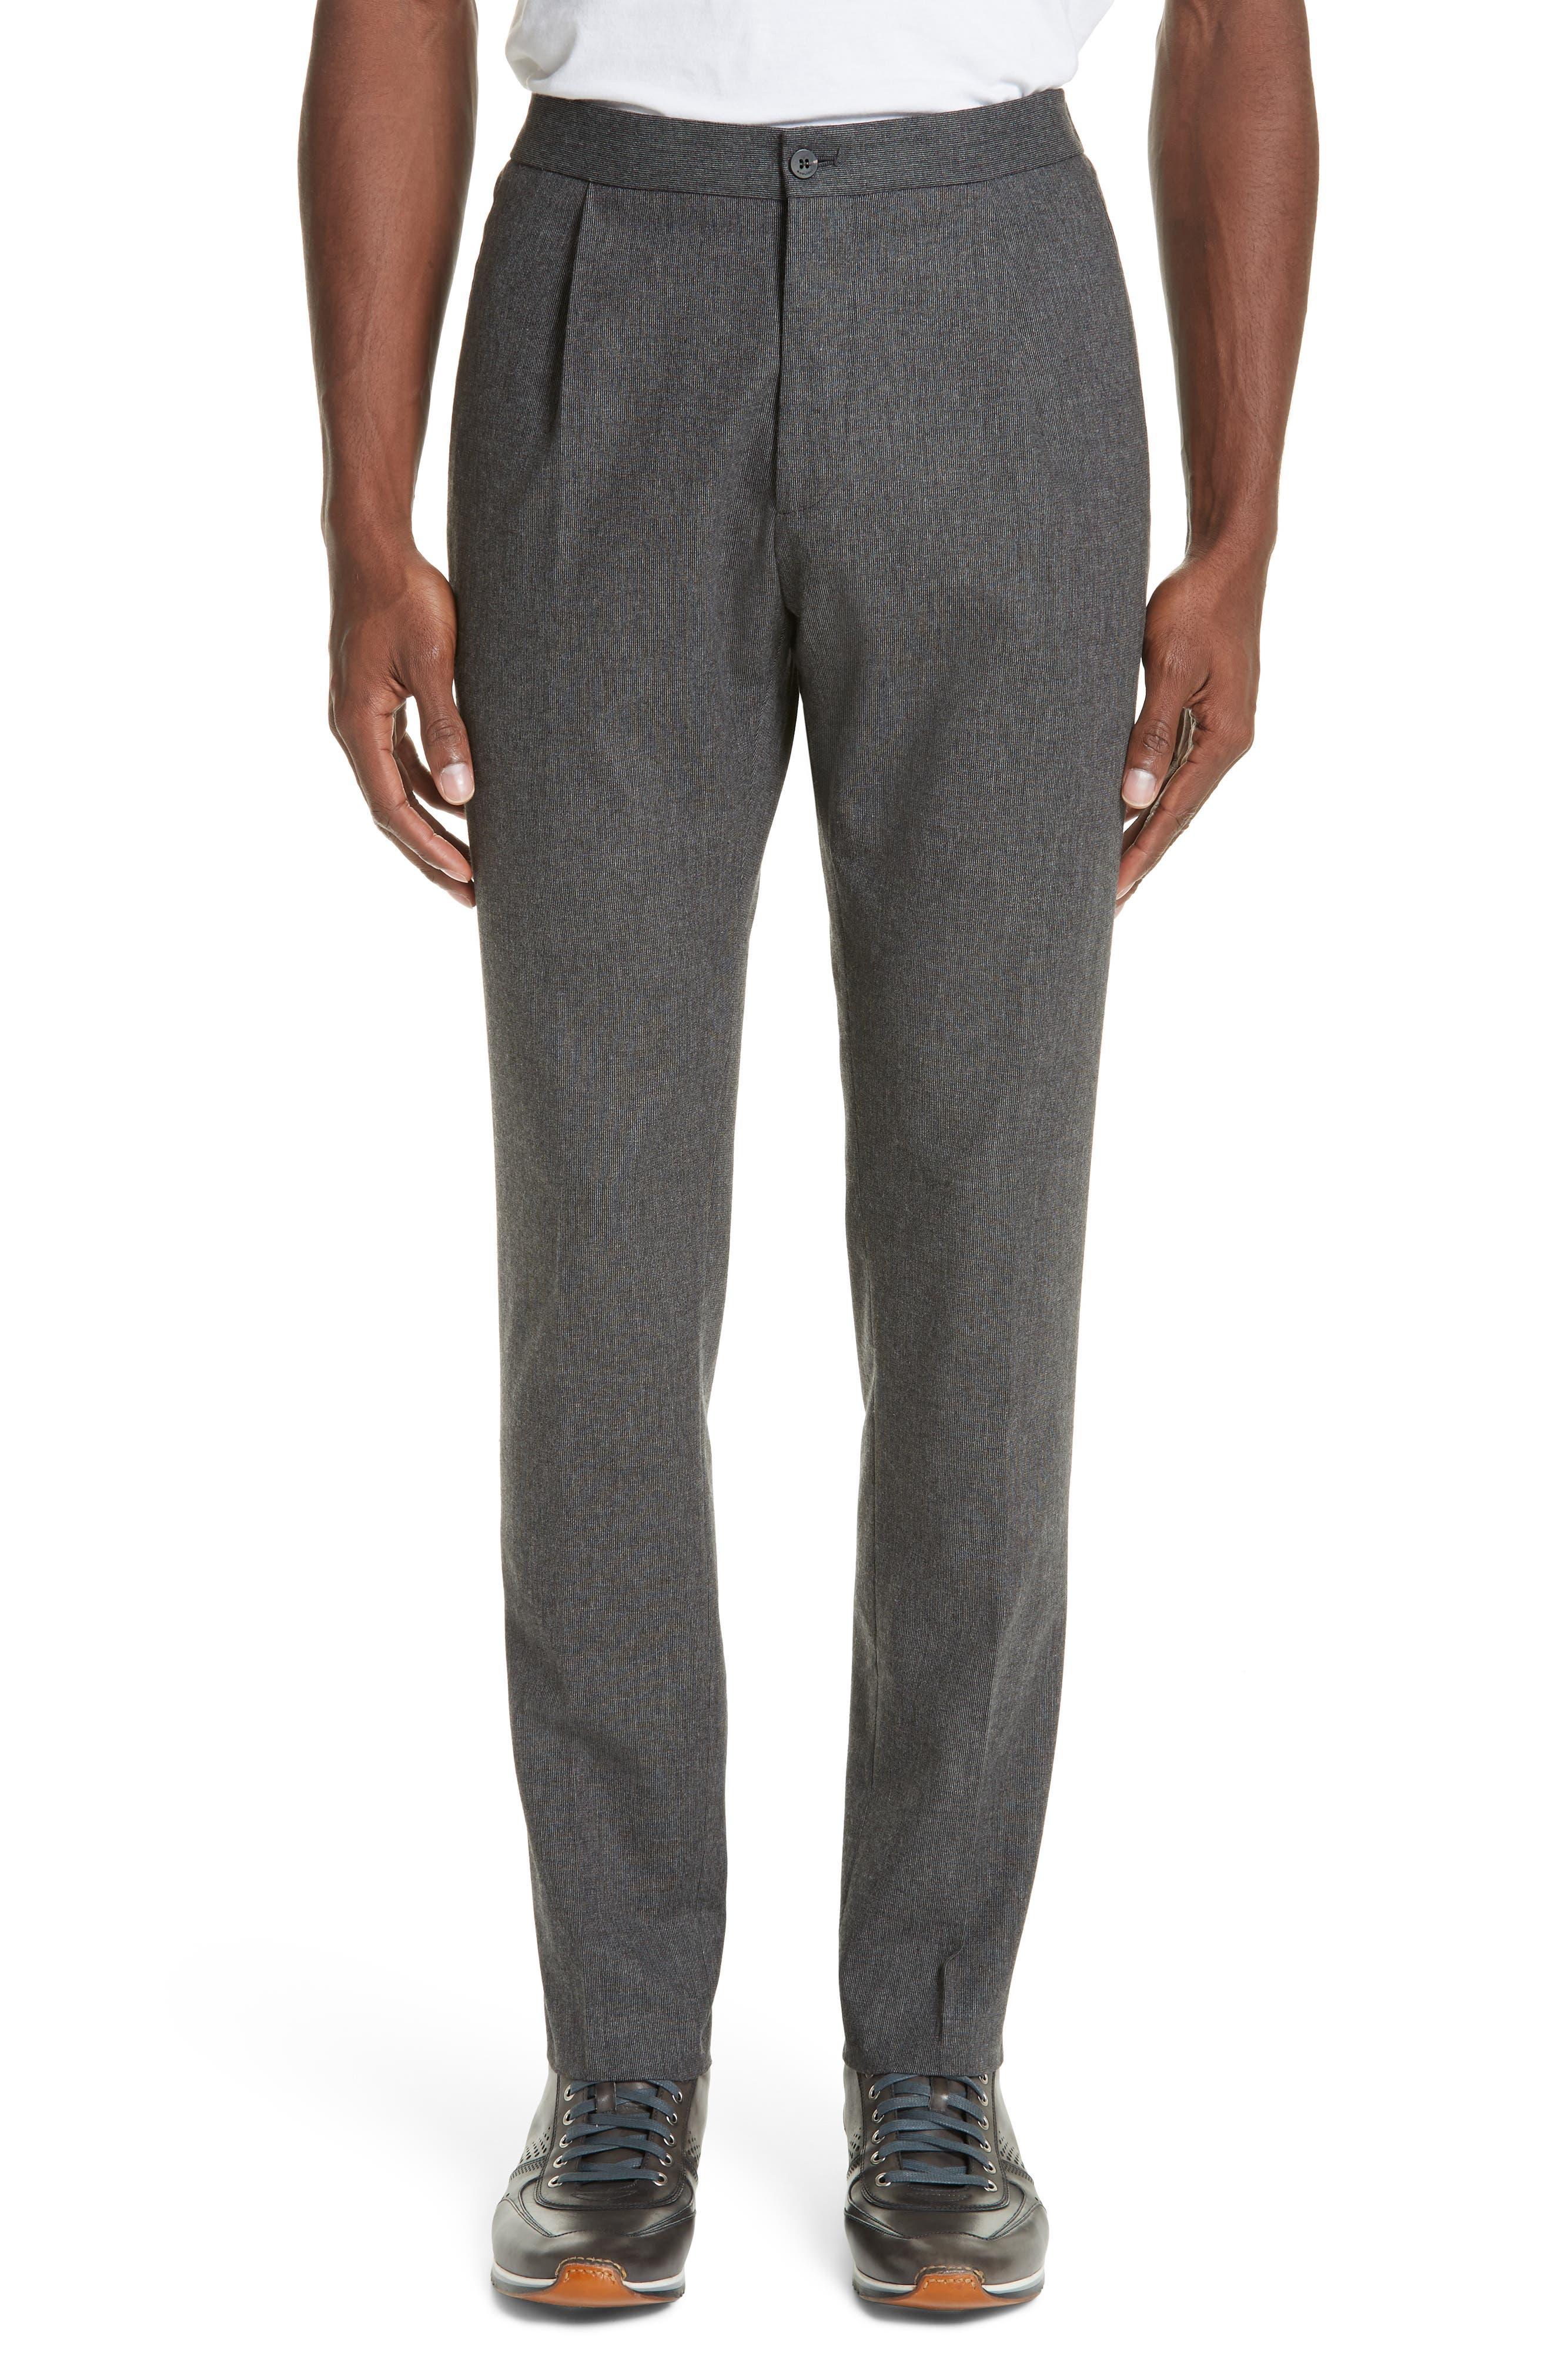 Trim Fit Sport Trousers,                         Main,                         color, CHARCOAL